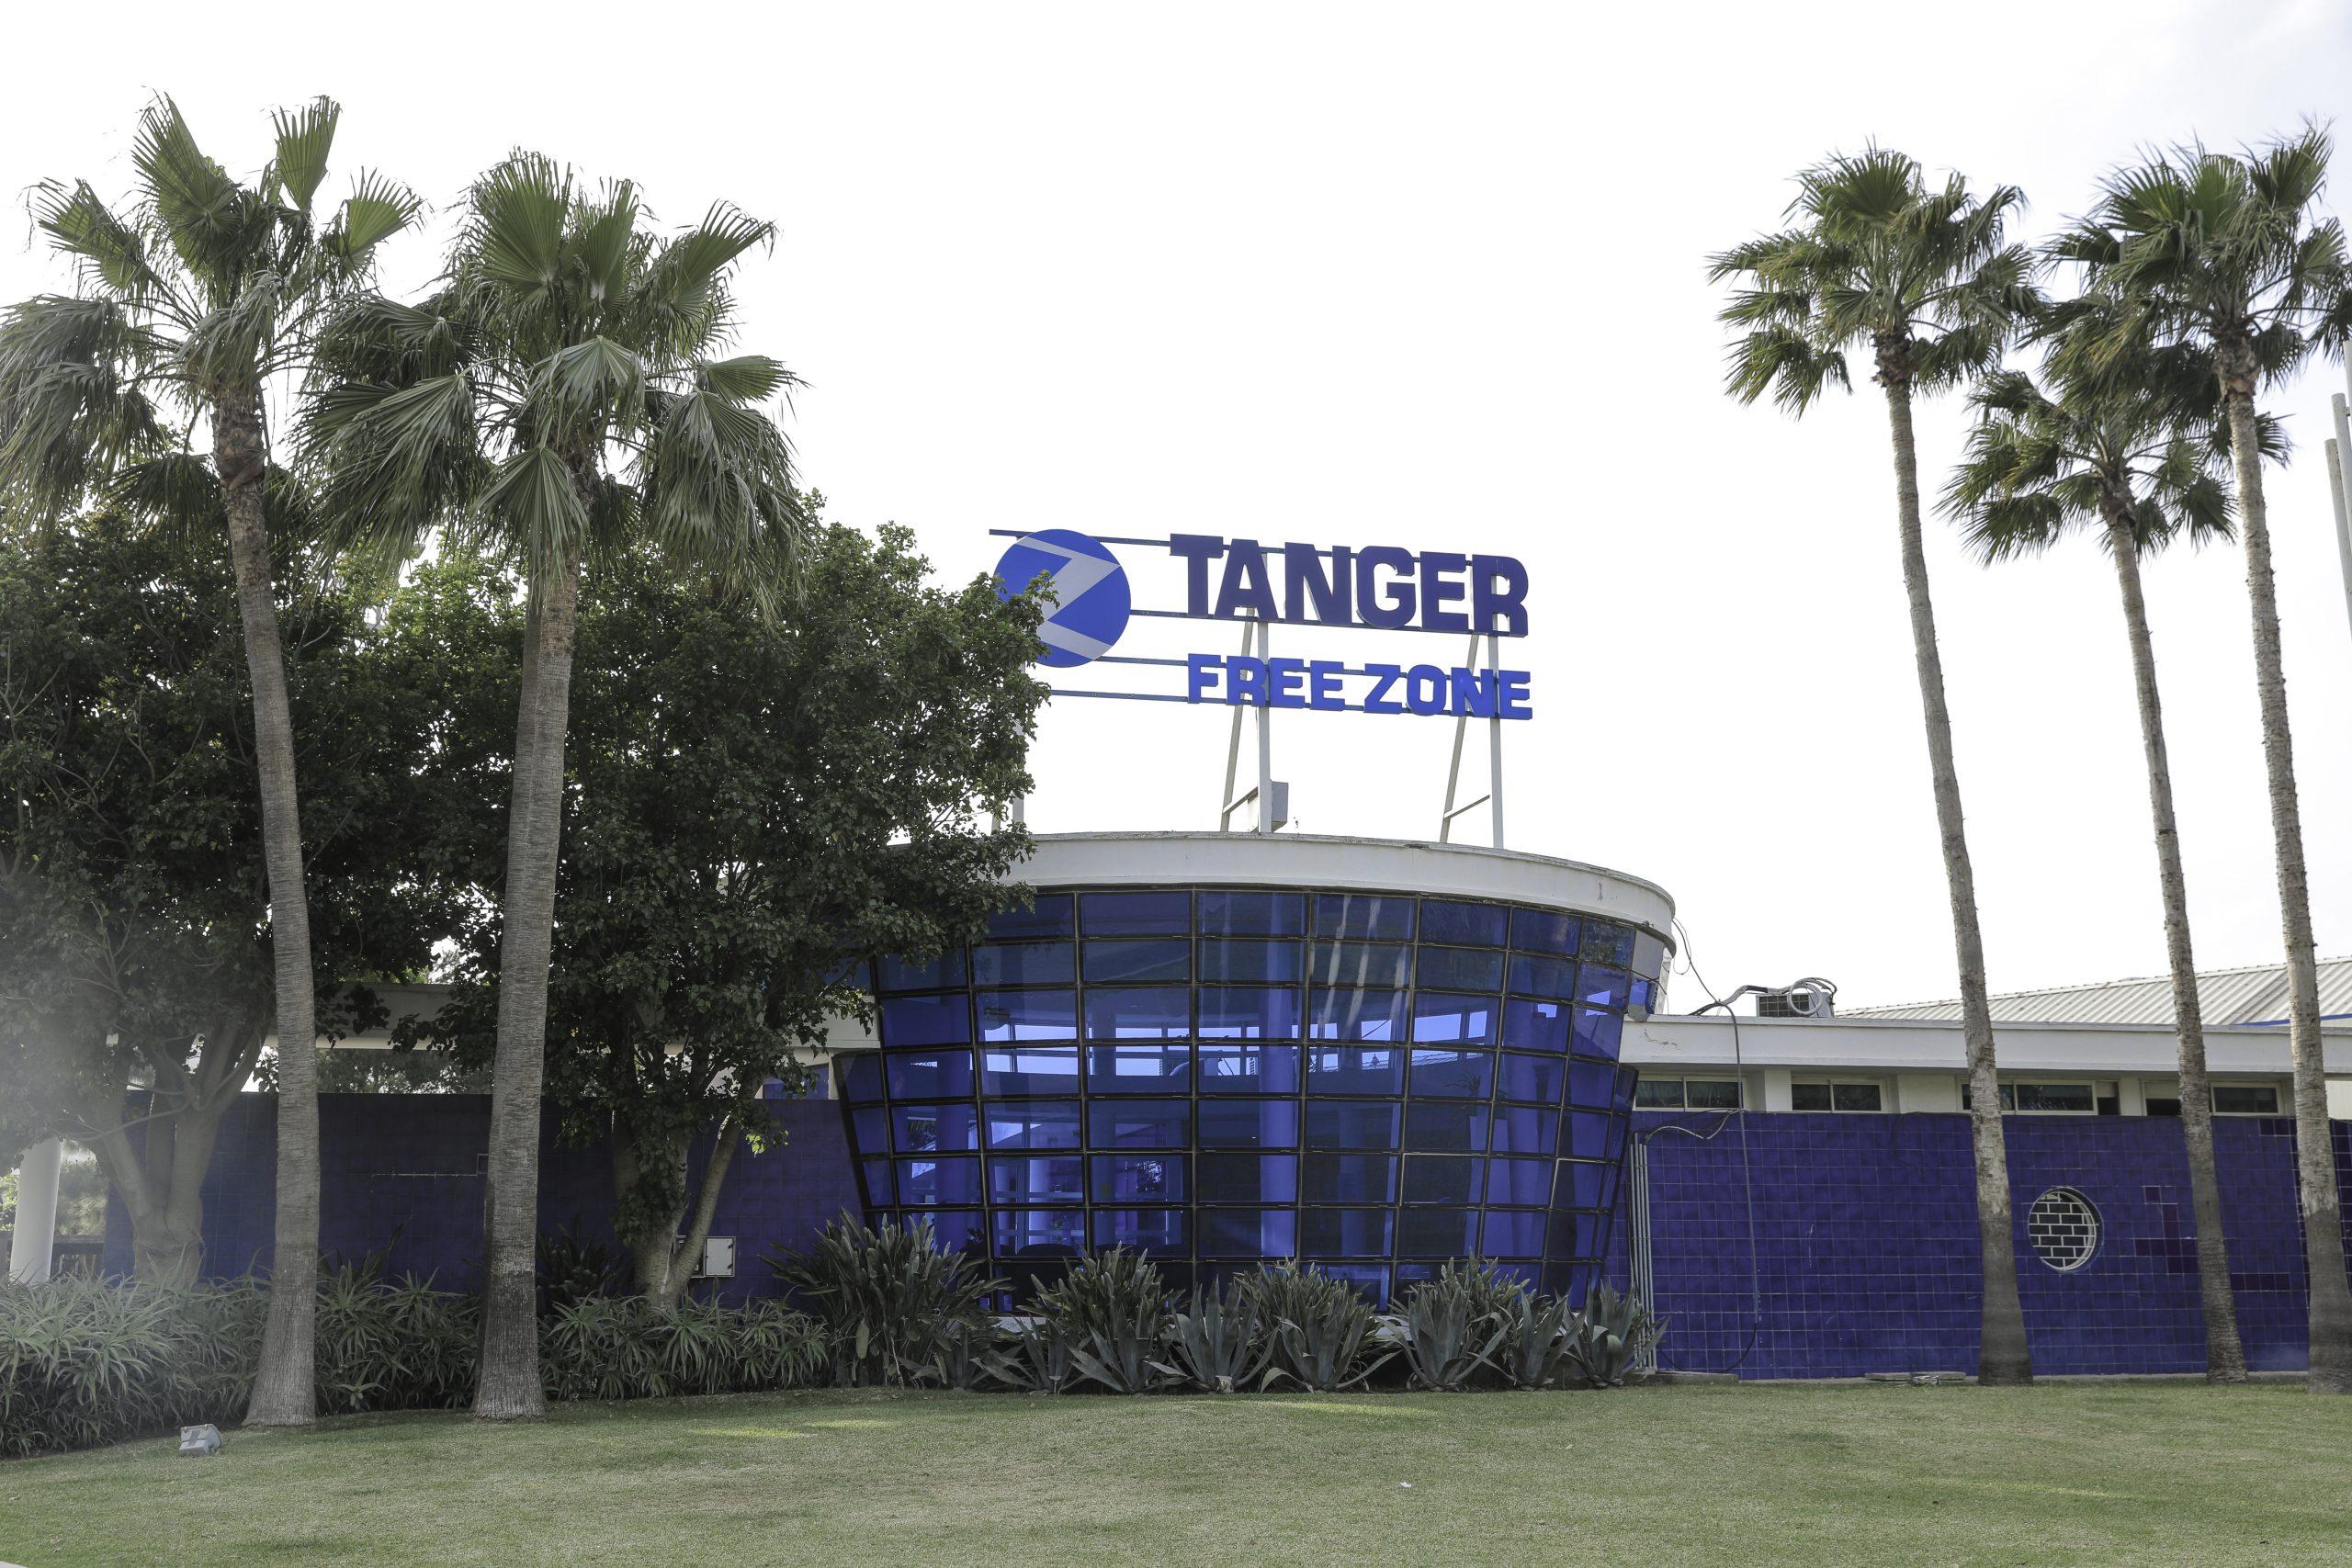 tanger free zones